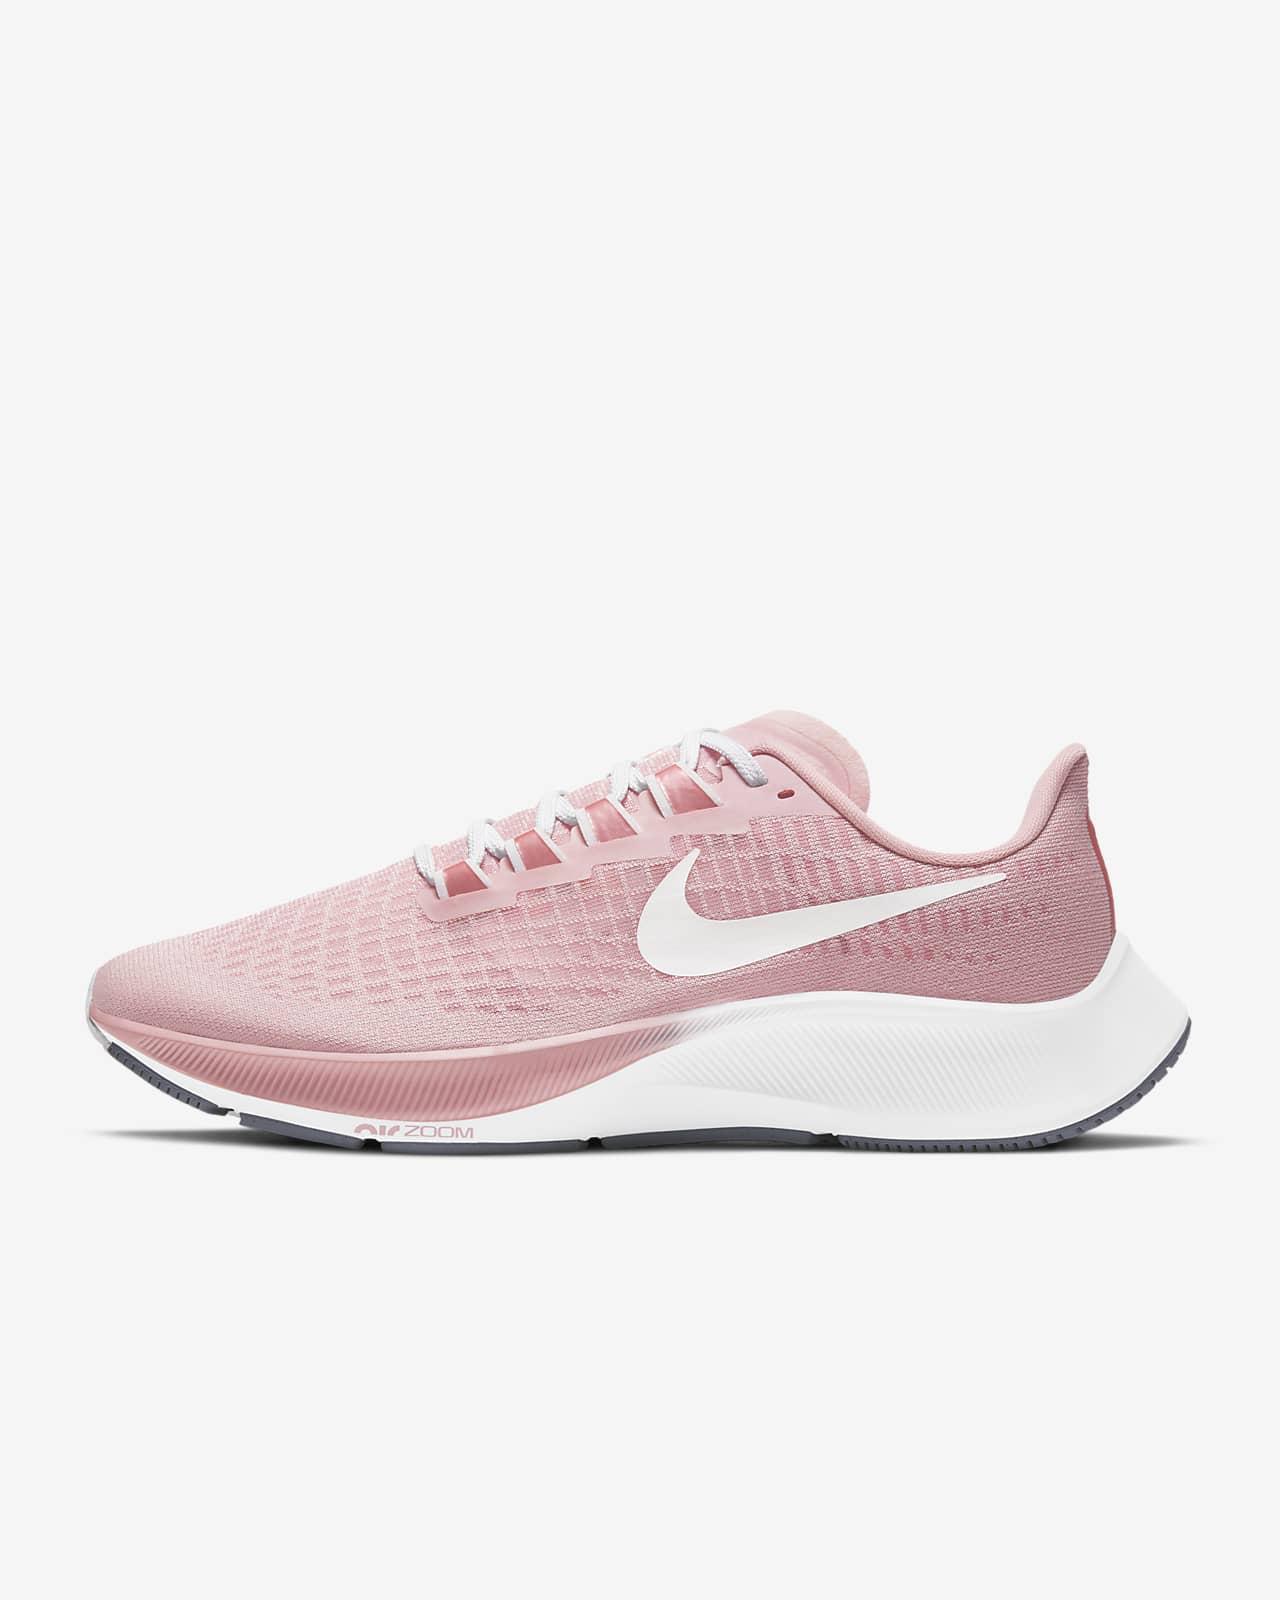 Nike Air Zoom Pegasus 37 Women's Road Running Shoes